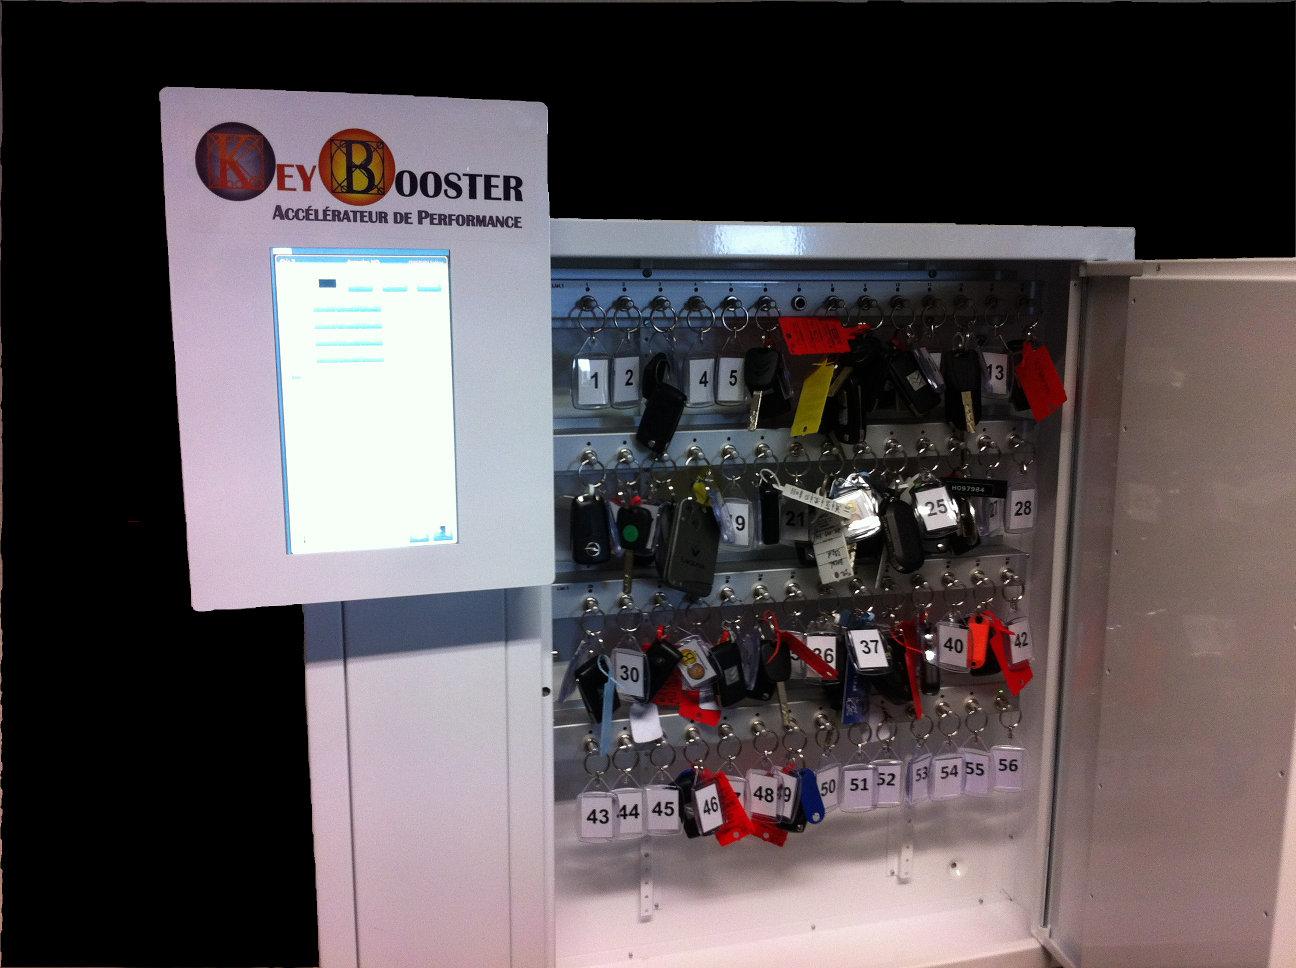 KeyBooster Le Systme Ddi Lorganisation Des